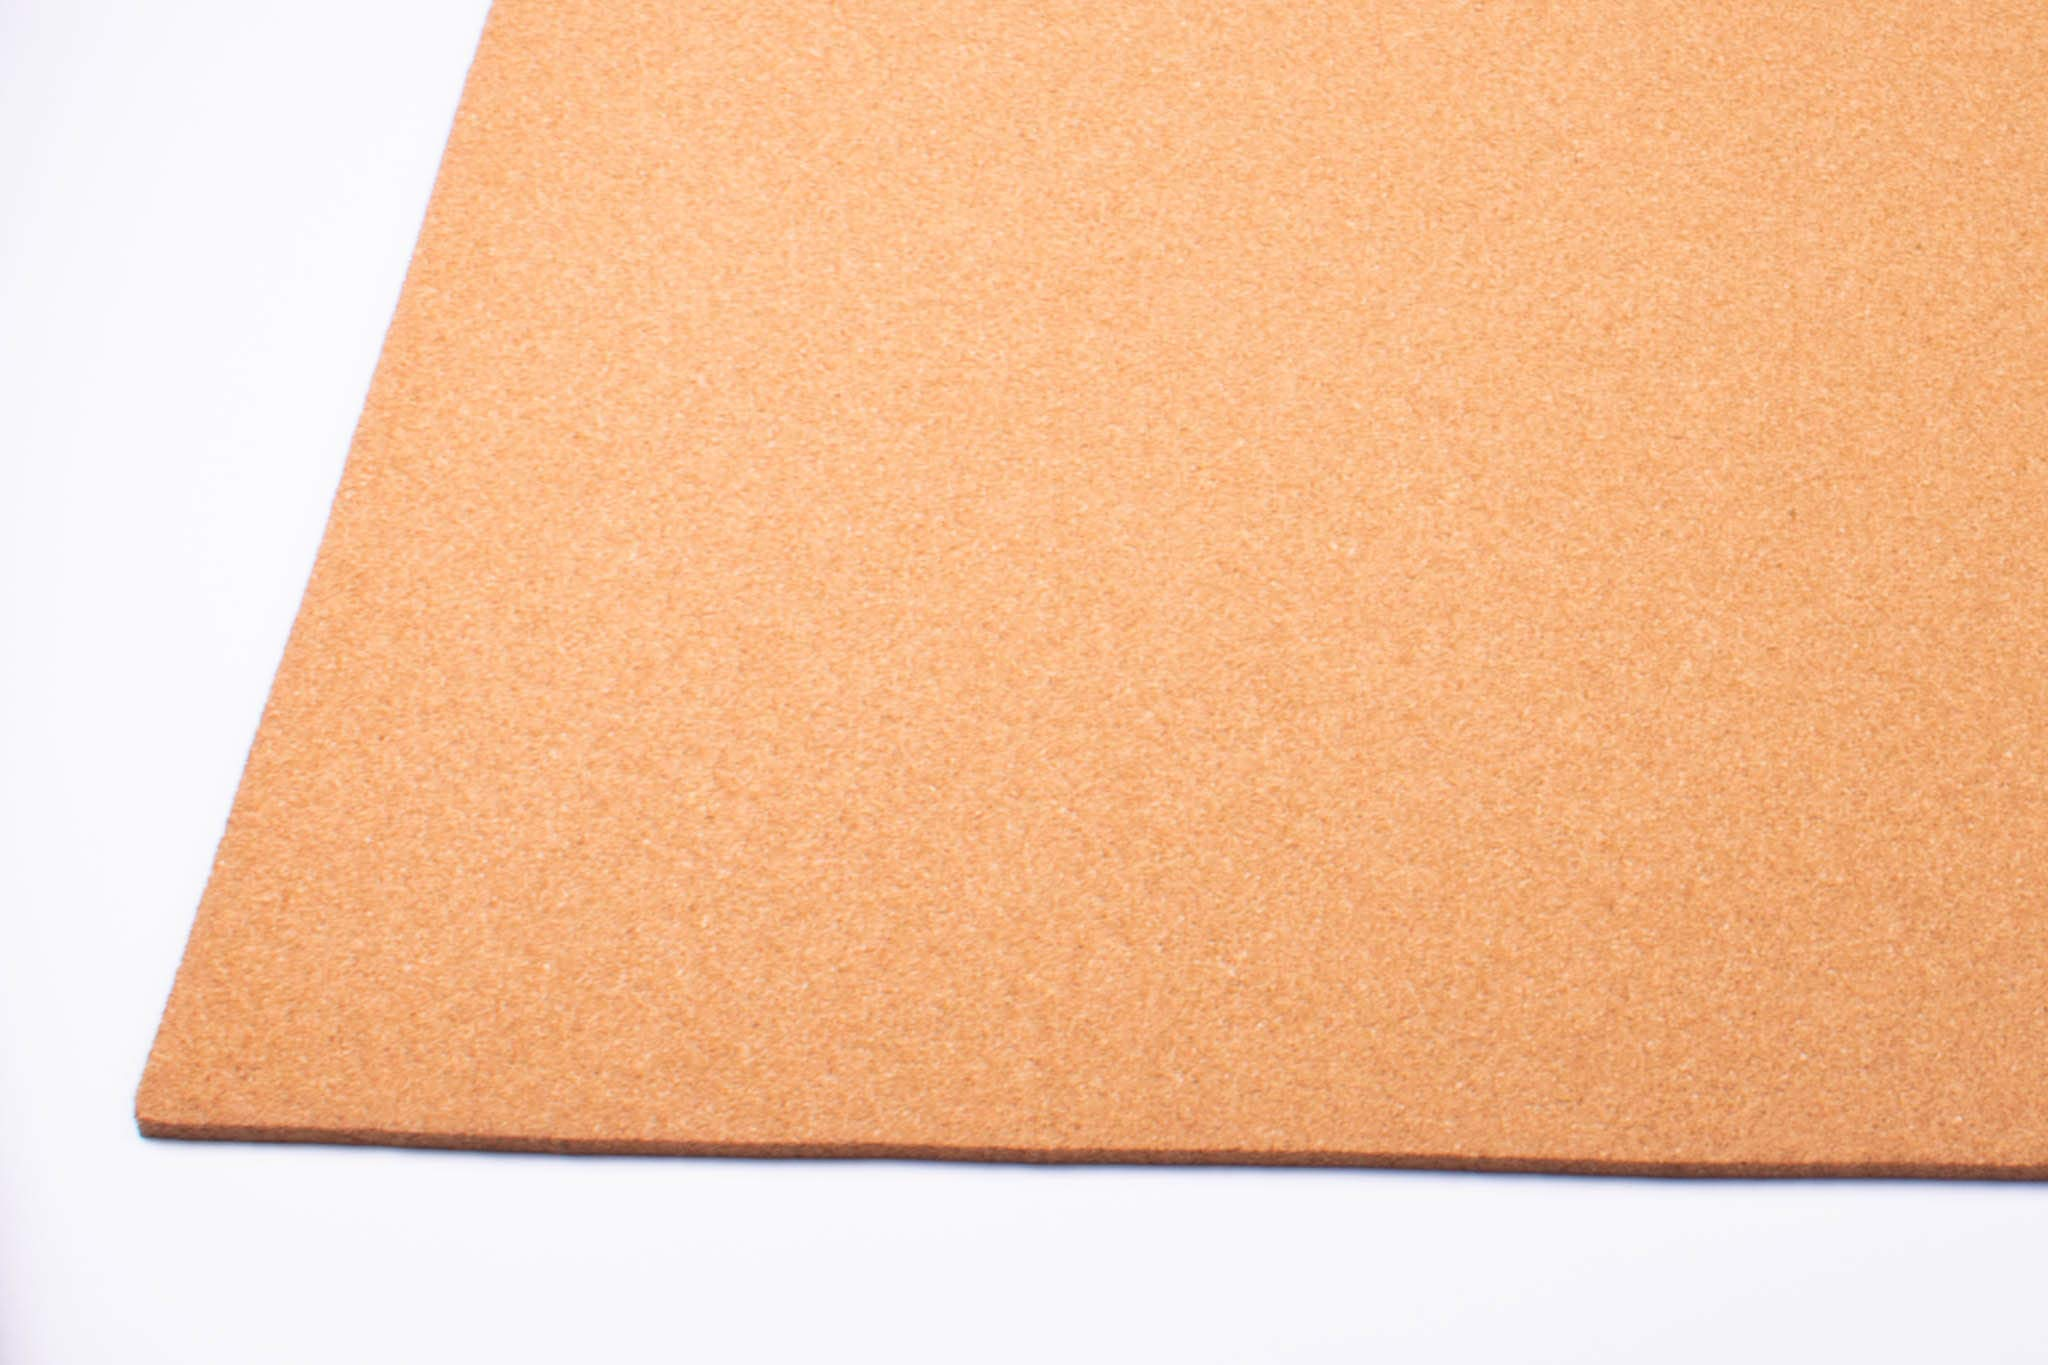 Fine Grain Cork Sheet 24in X 36in X 1/8in by GravitationOnline